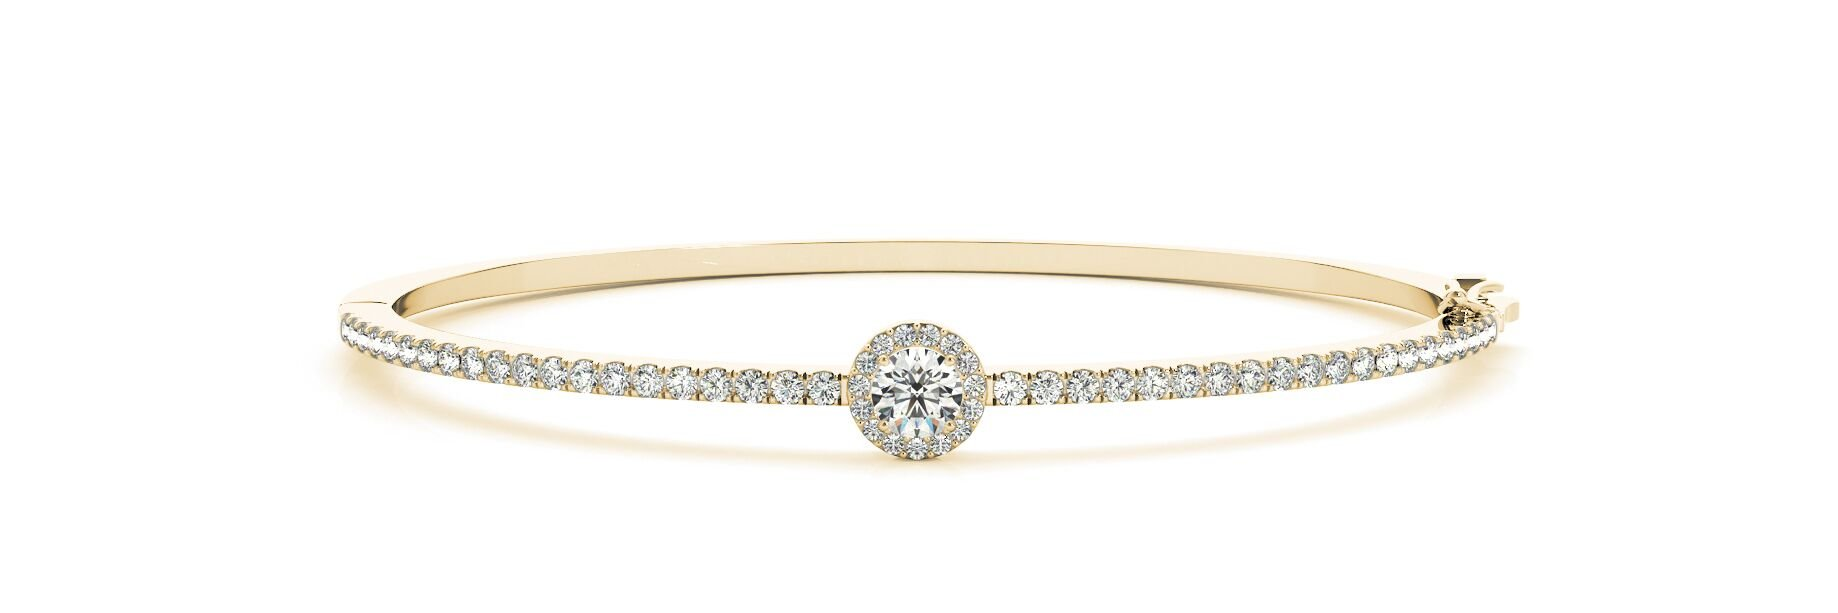 Halo Diamond Bangle Bracelet